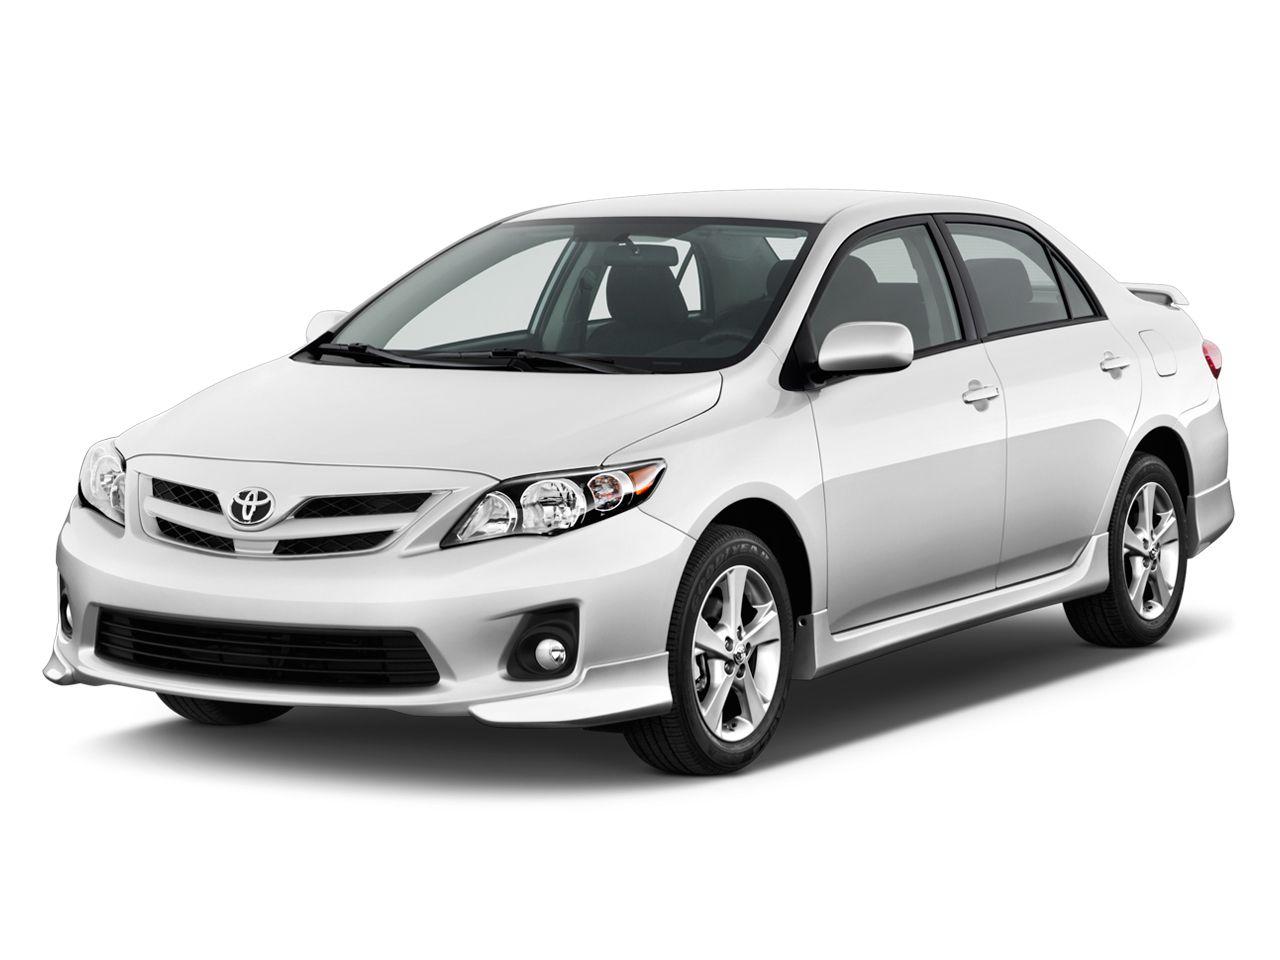 Toyota gsic toyota corolla nze141 zze142 zre141 142 143 ce14